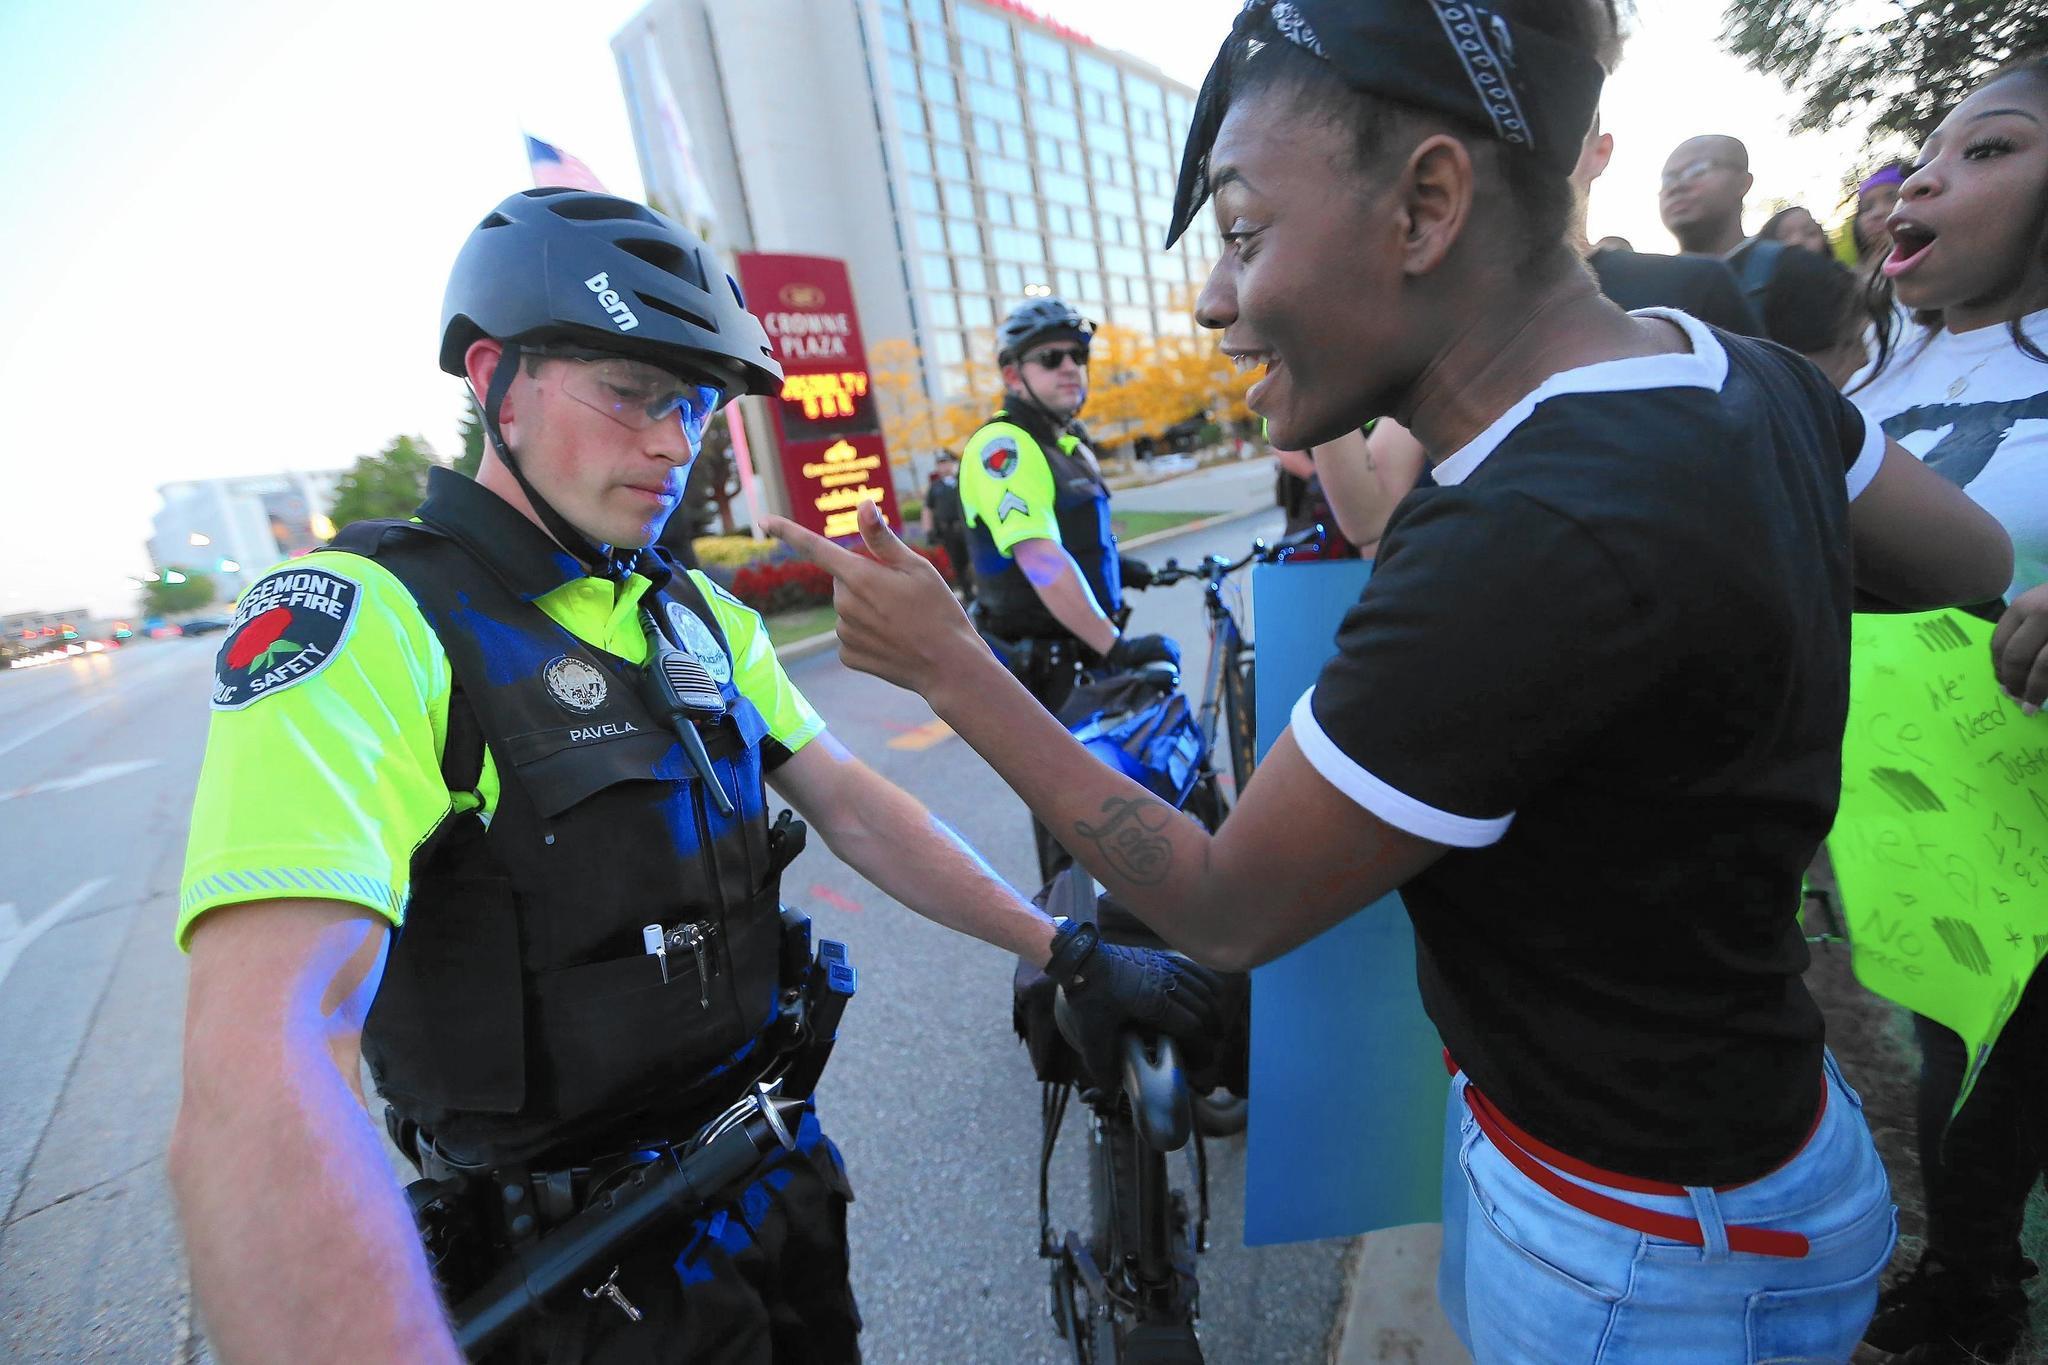 Kenneka Jenkins Case Highlights Mistrust Of Police